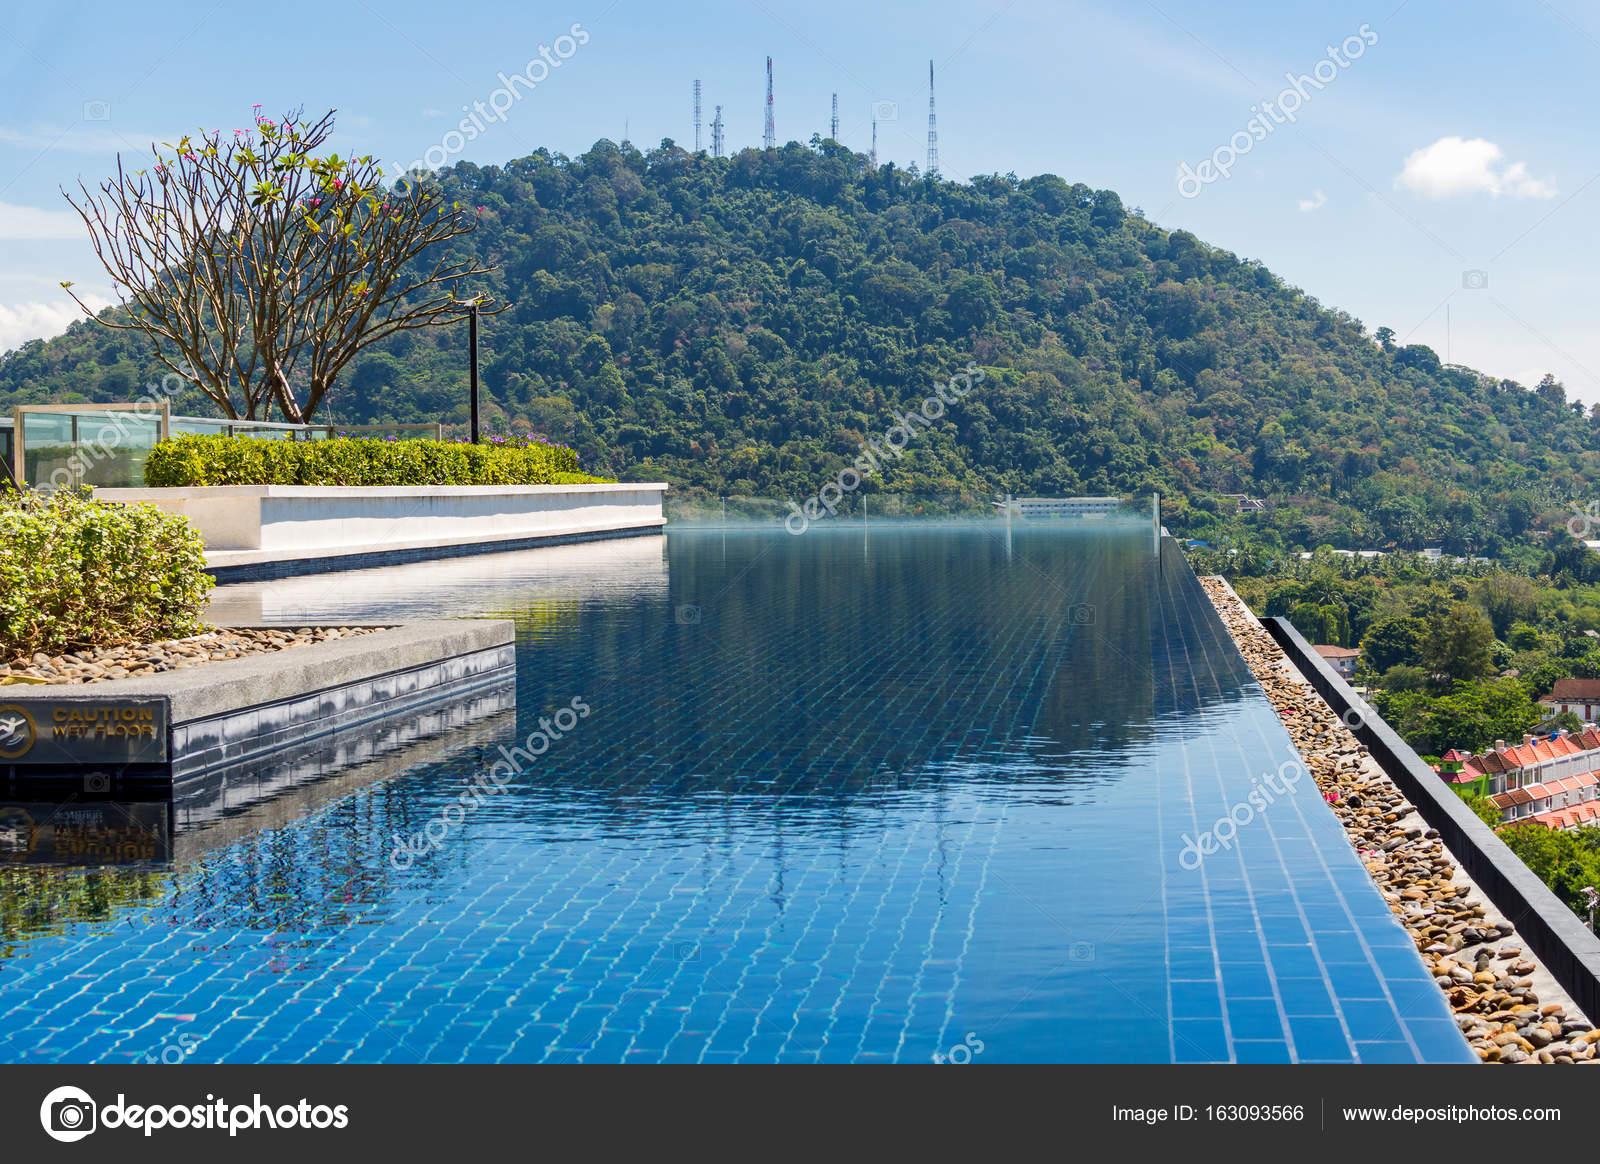 Zwembad Op Dakterras : Zwembad op dakterras met prachtig uitzicht u stockfoto